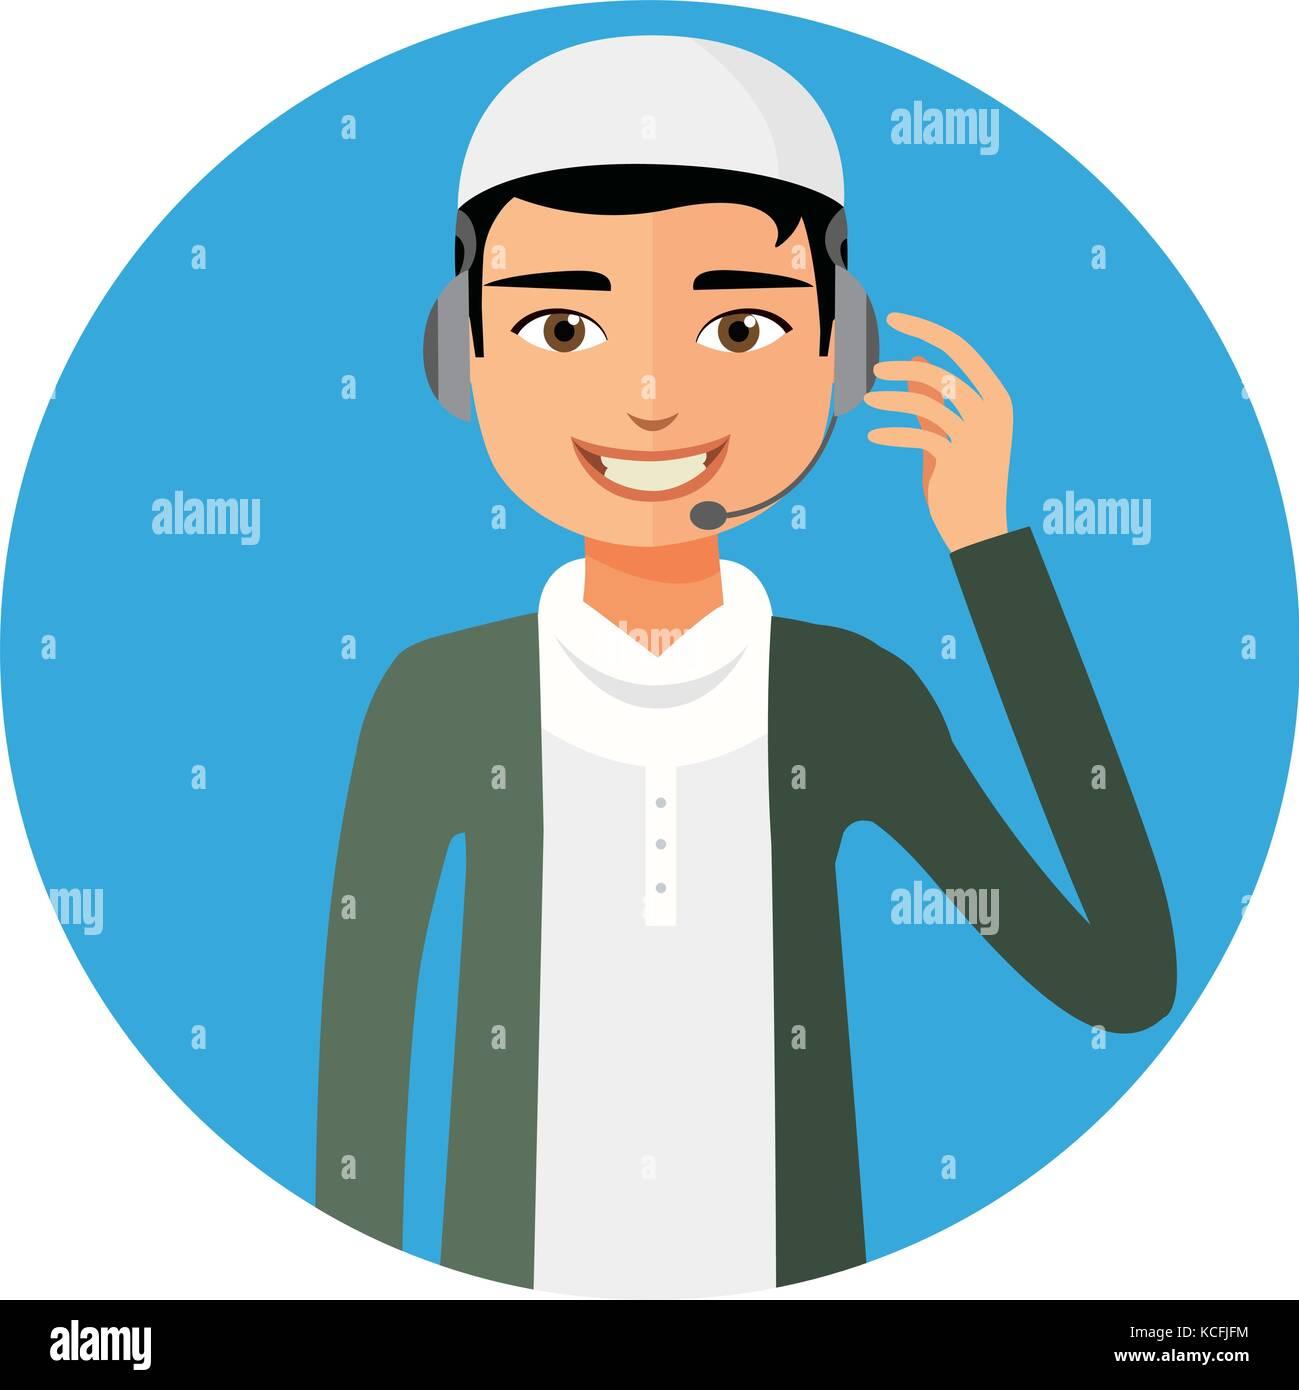 Arab yemen operator man with headset customer service helpdesk service. Call center concept  flat cartoon vector - Stock Vector